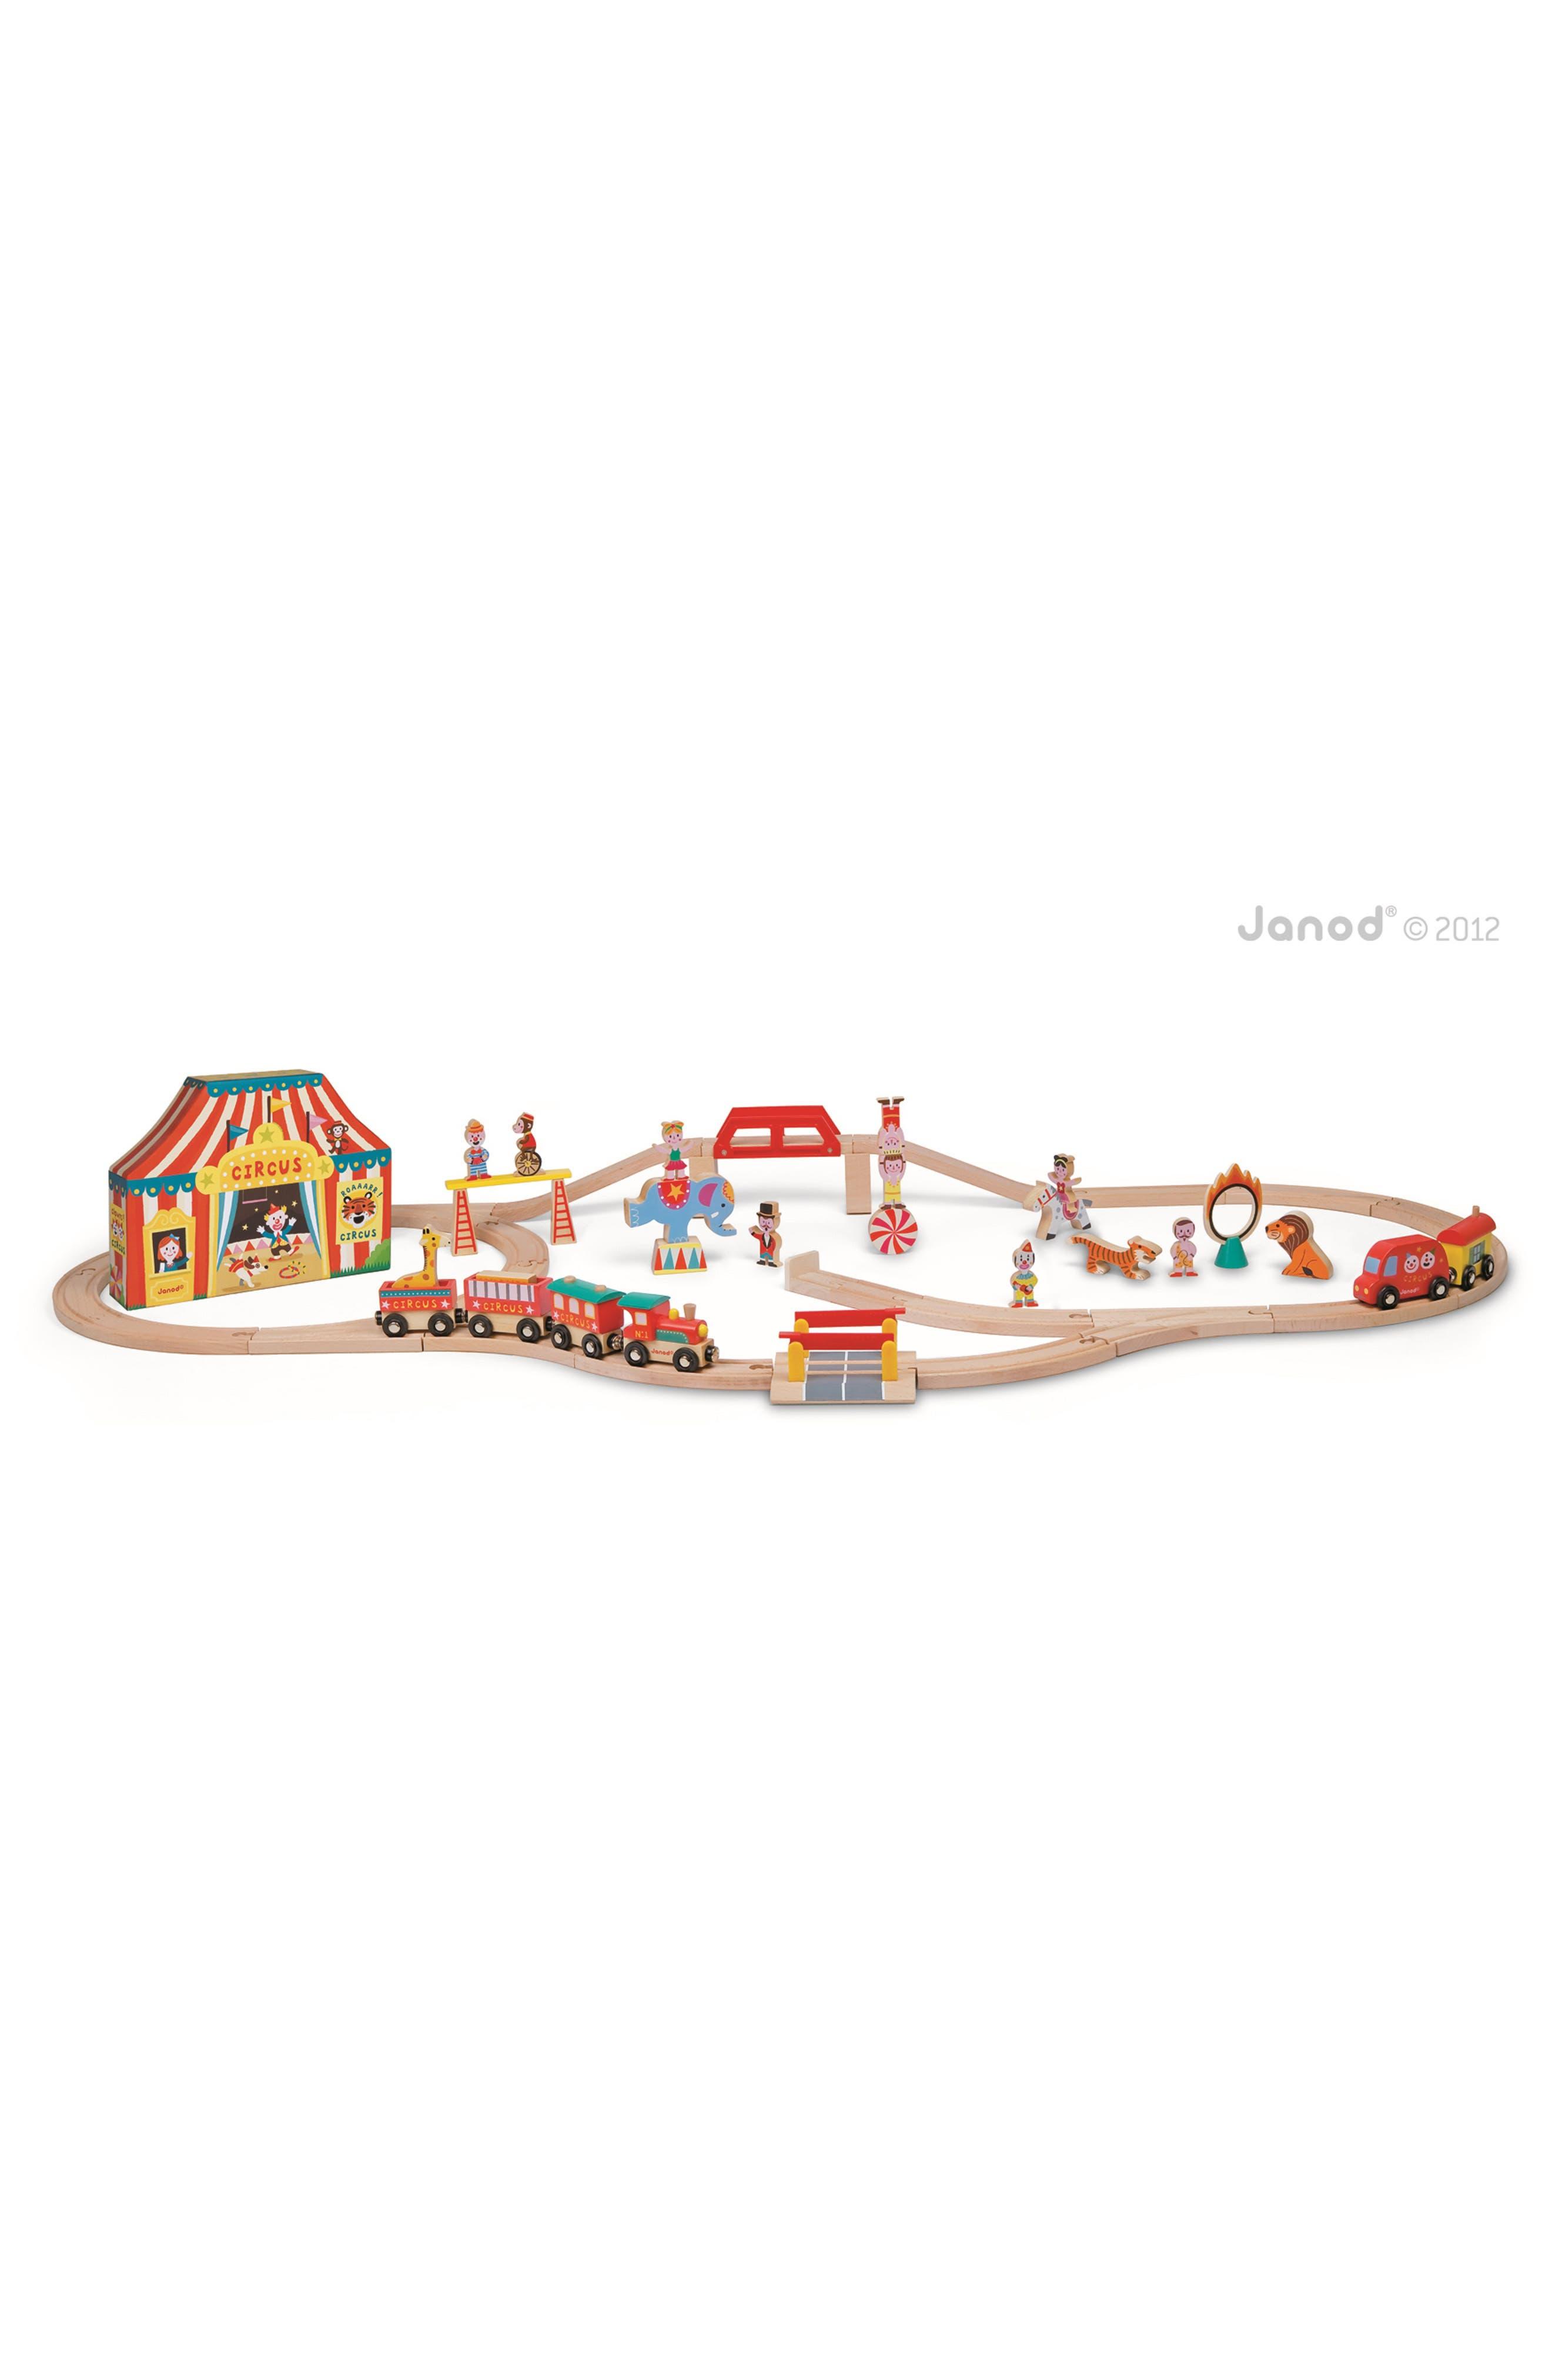 Janod 'Story Express - Circus' Train Set